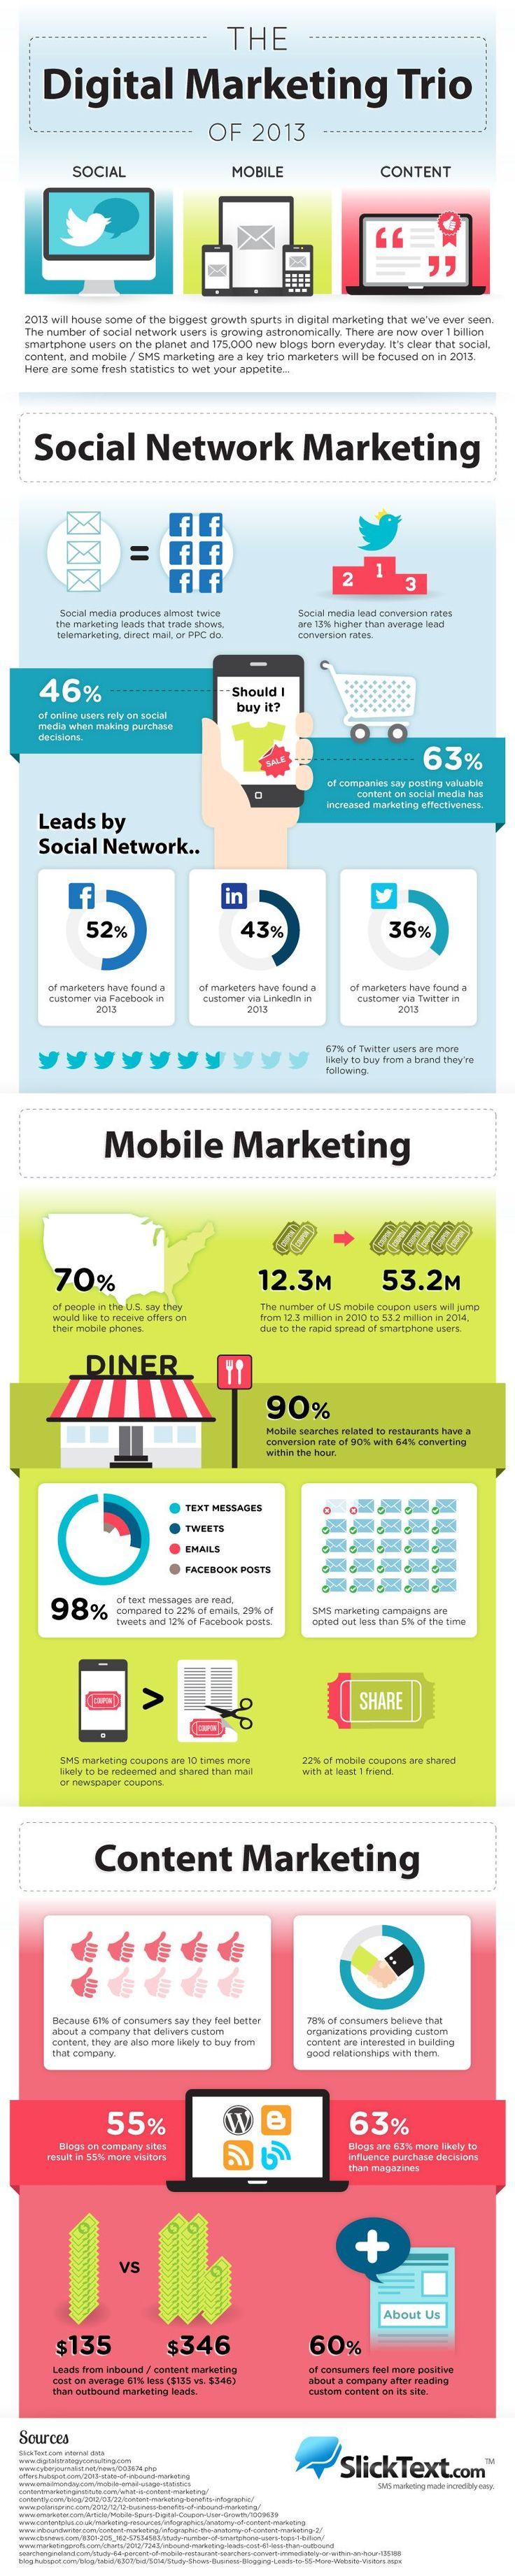 The Digital Marketing Trio Of 2013 [Infographic] image digital marketing trio